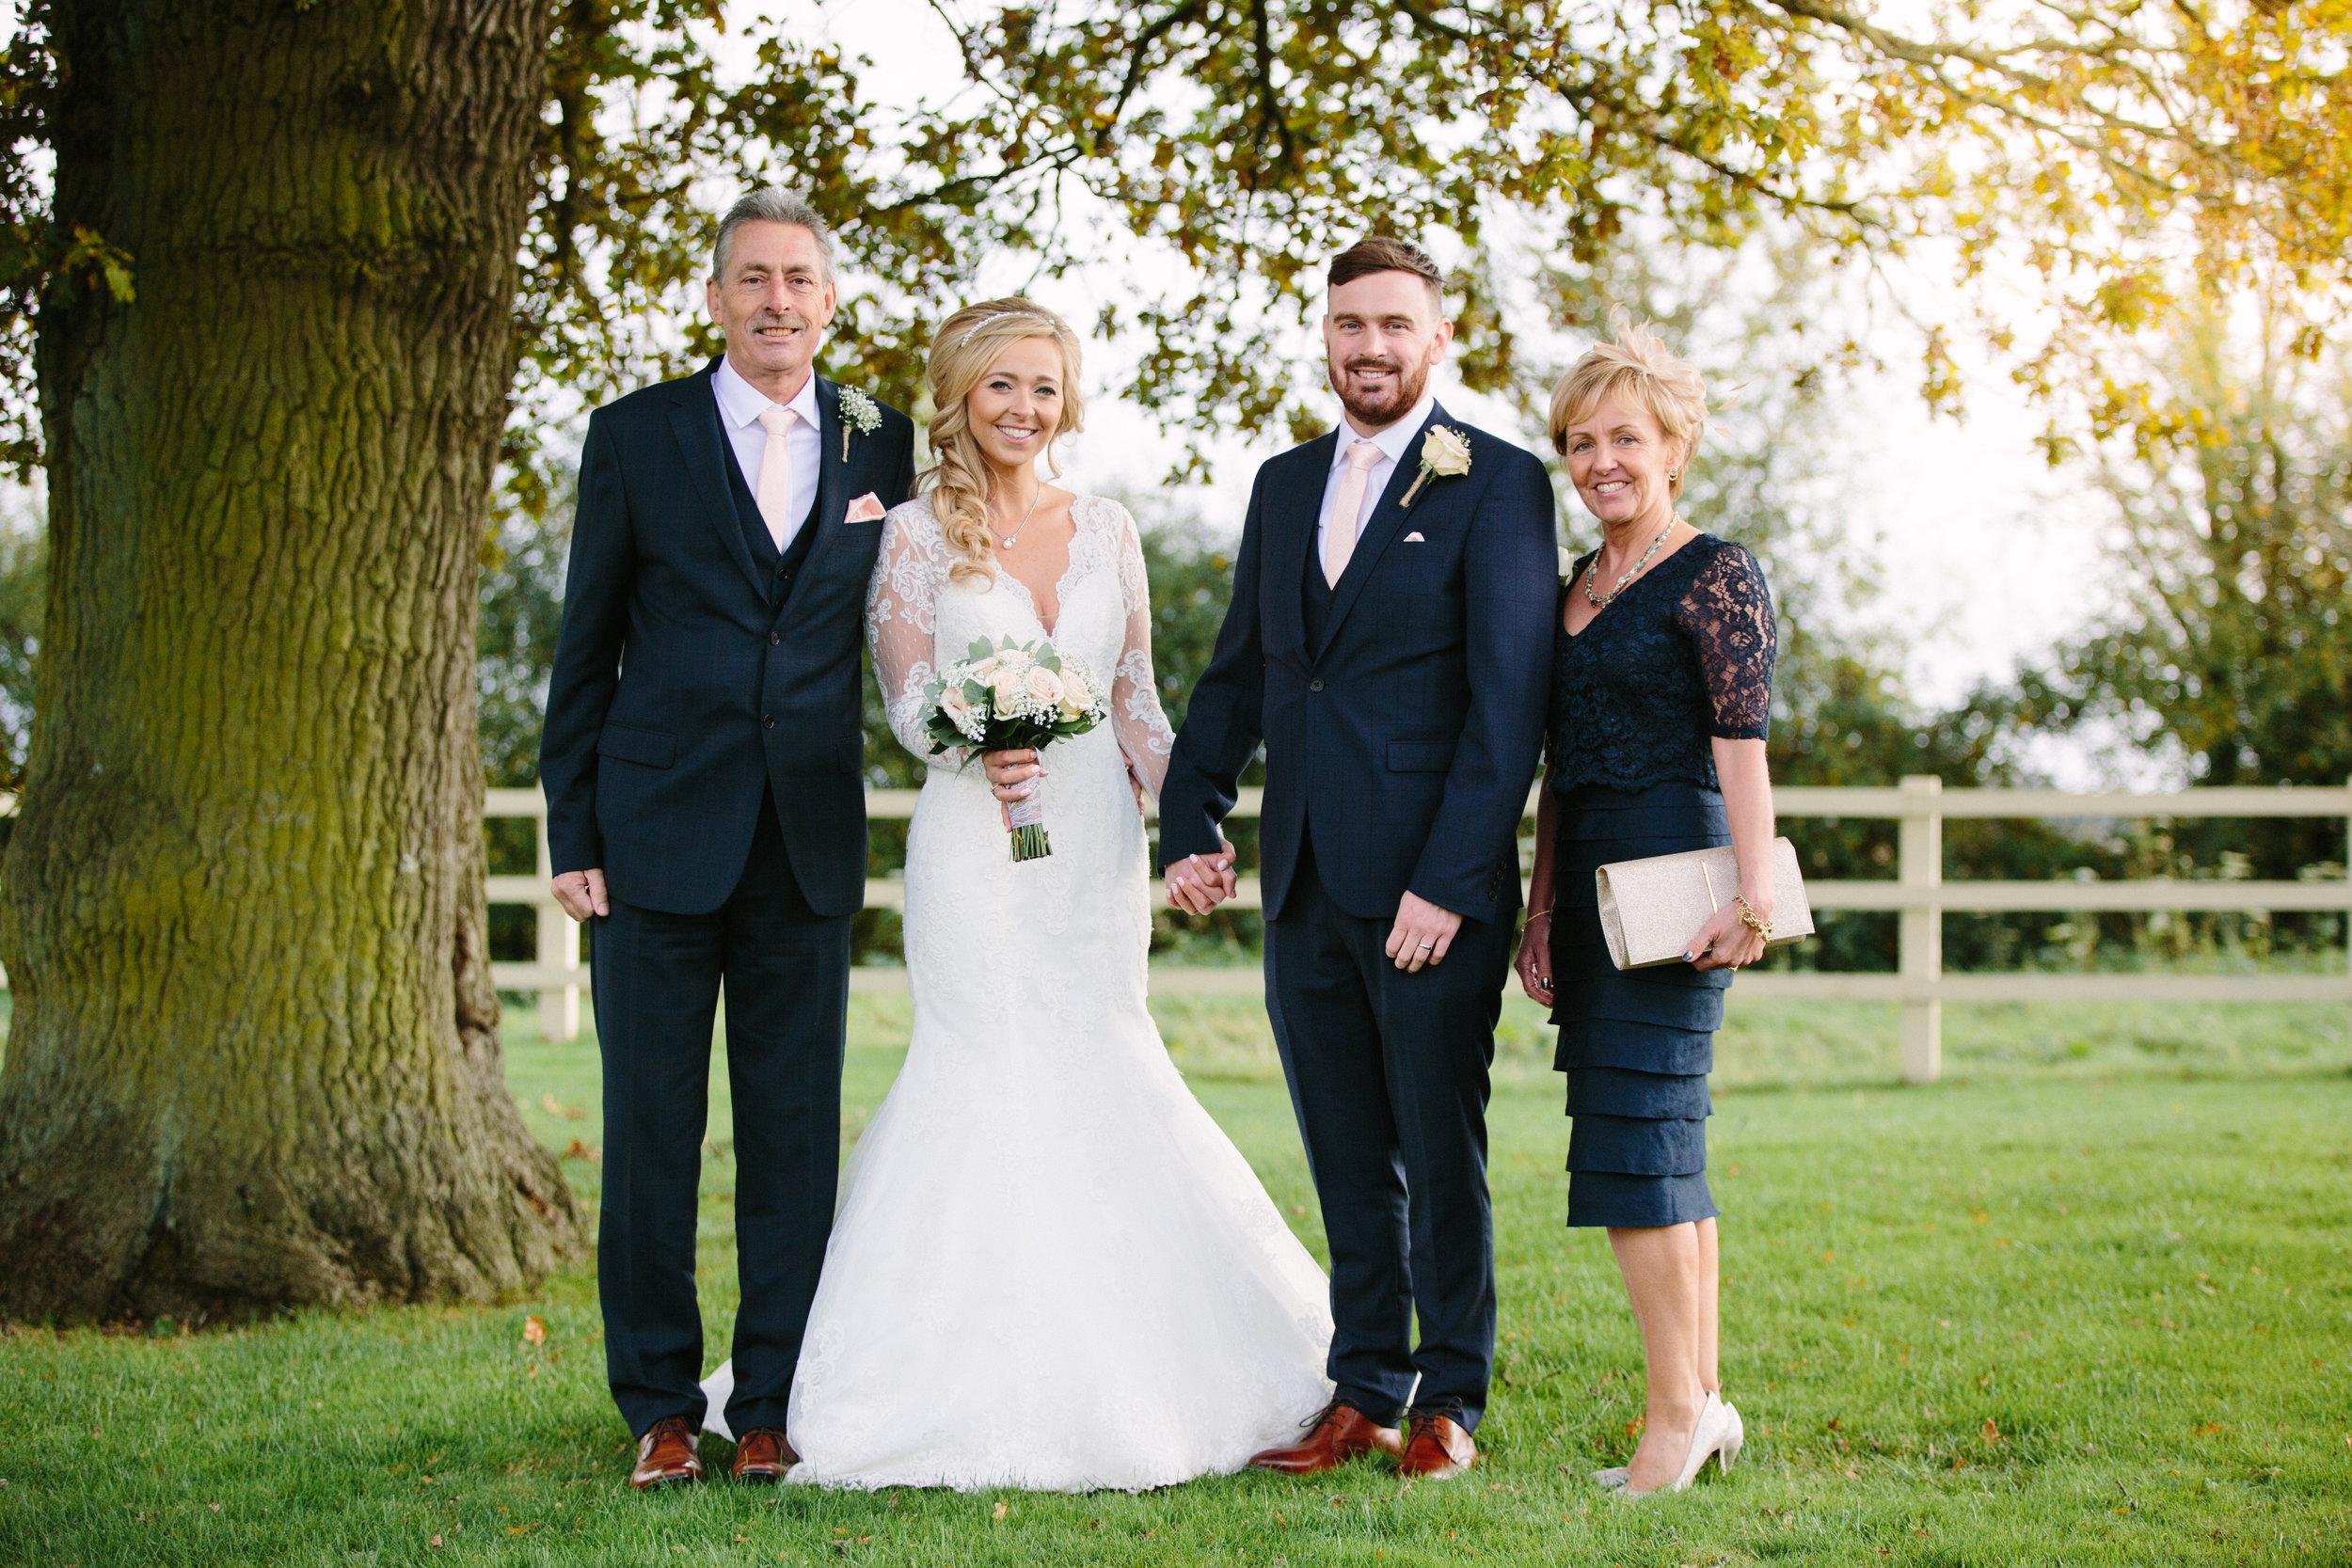 london-hertfordshire-wedding-photography-milling-barn-ceremony-51